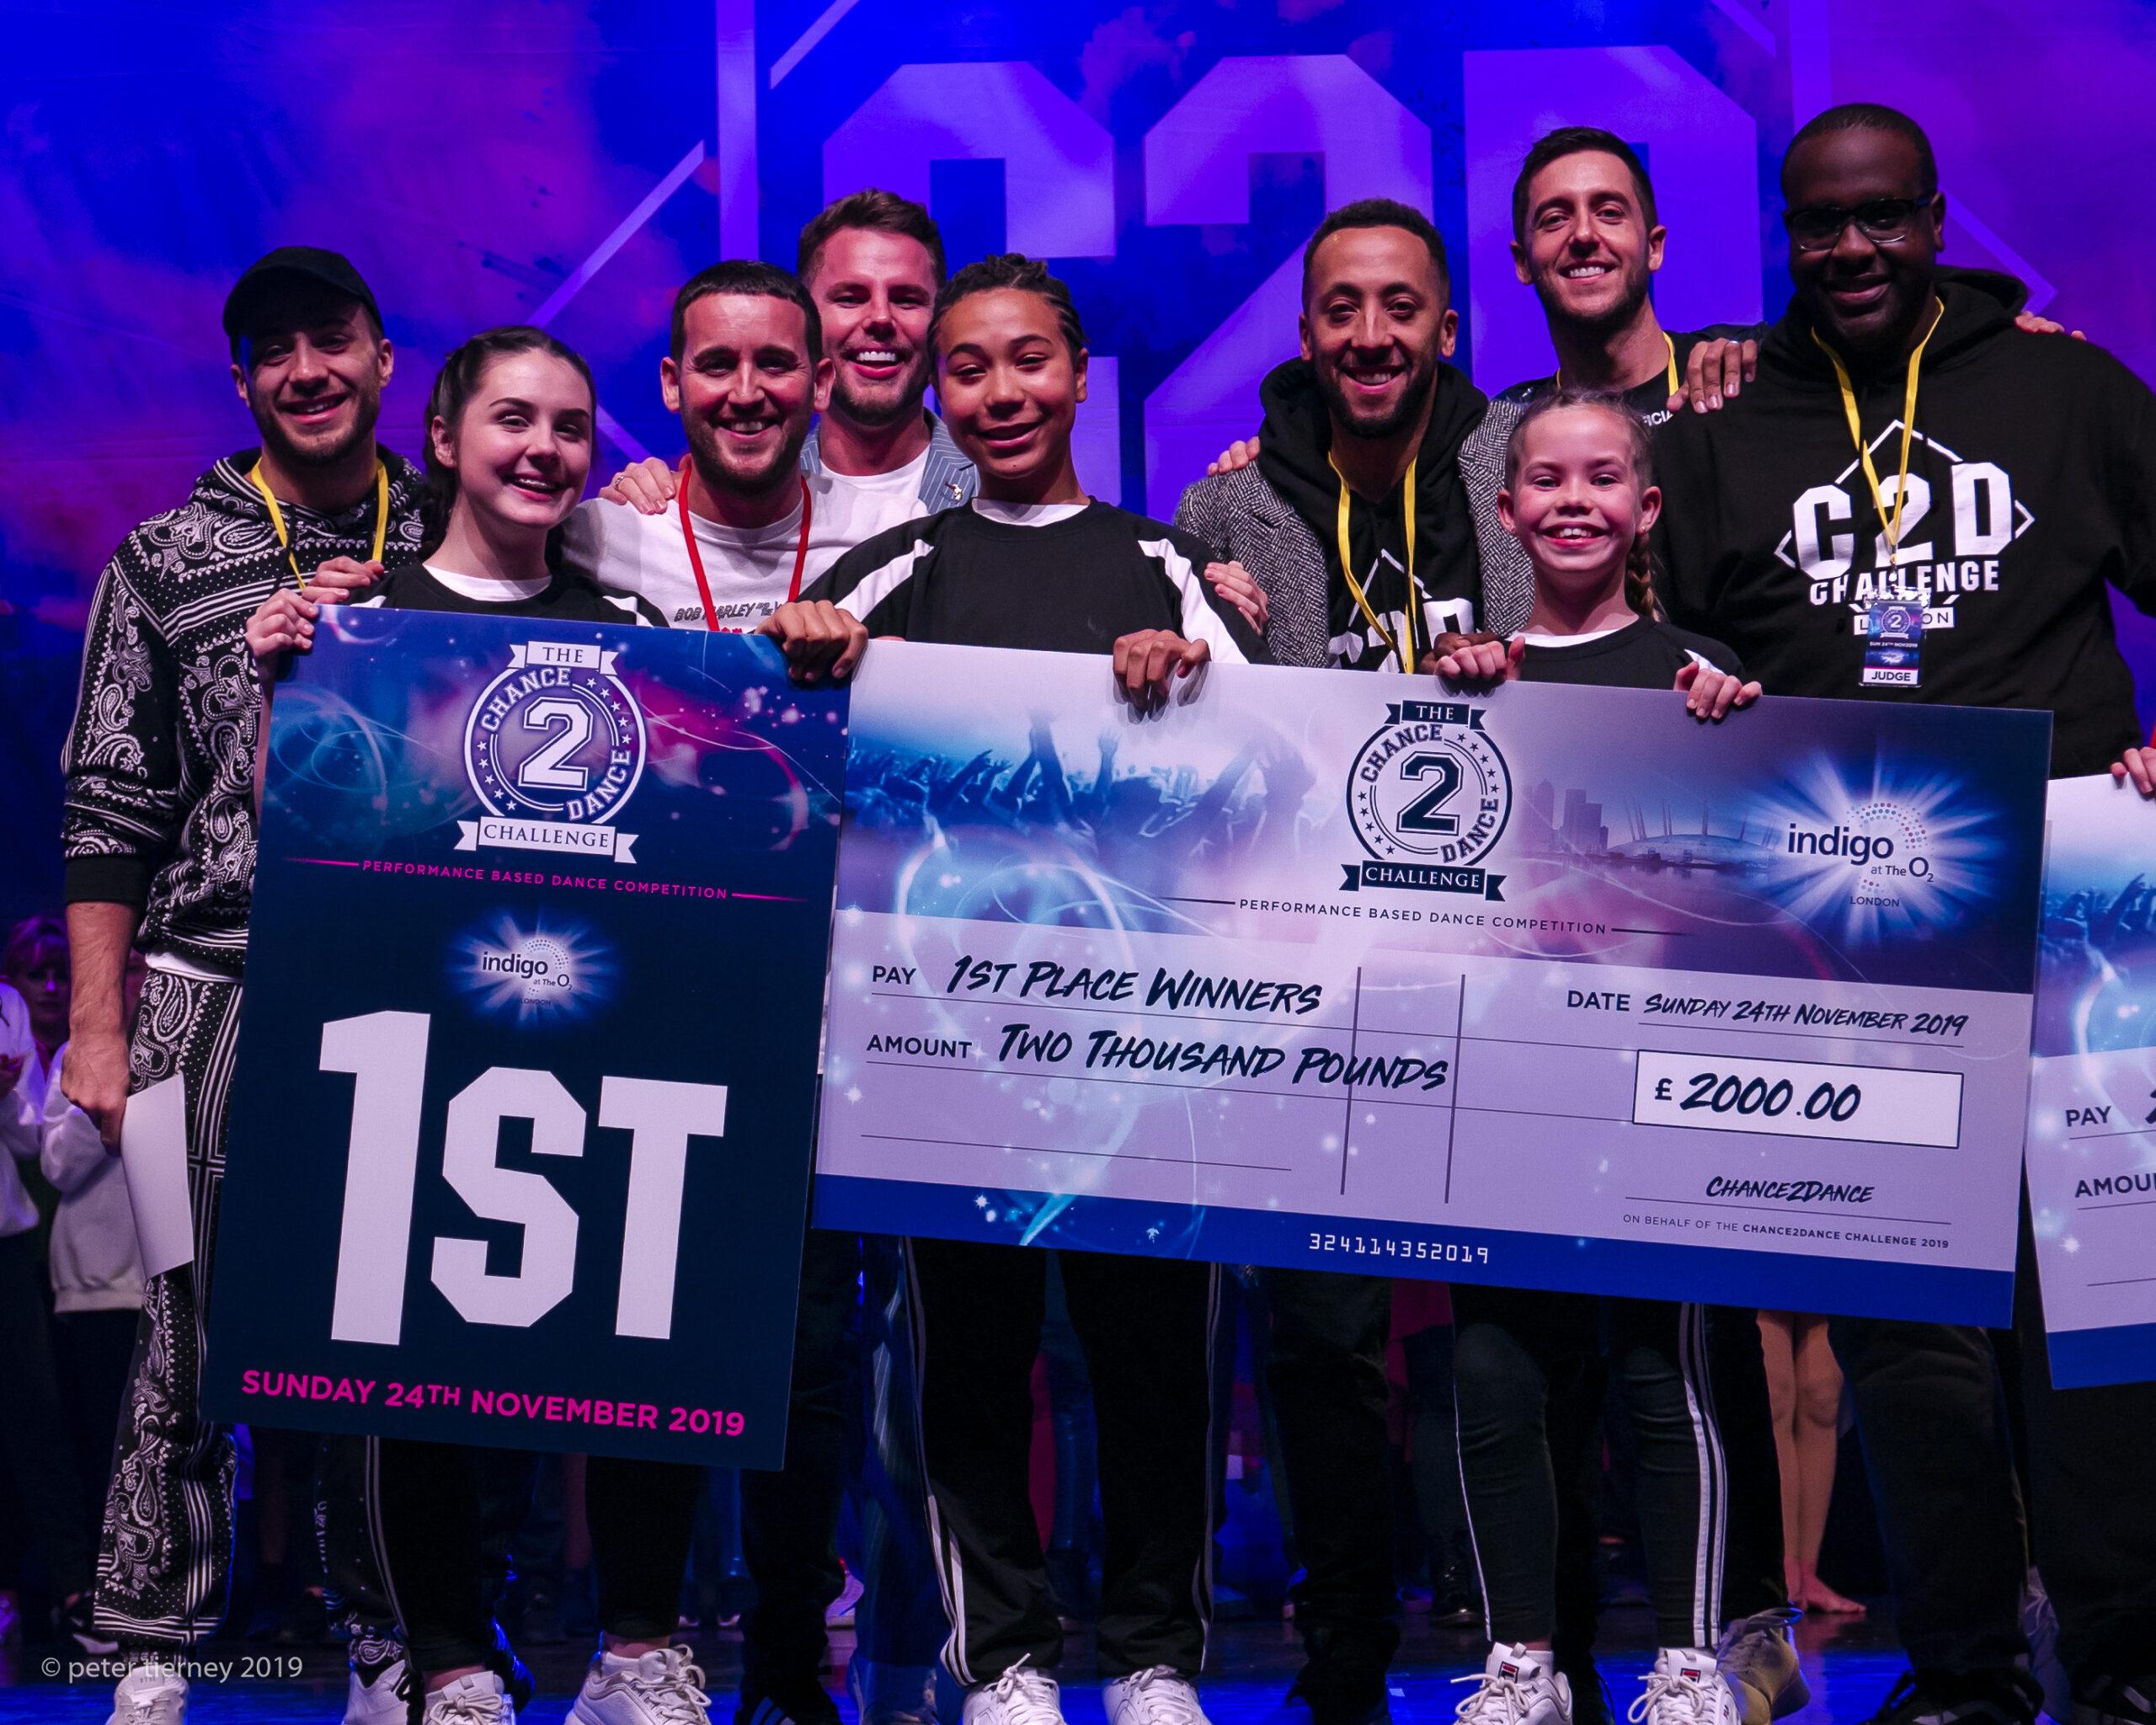 Urban City Dancers win comp at O2 London